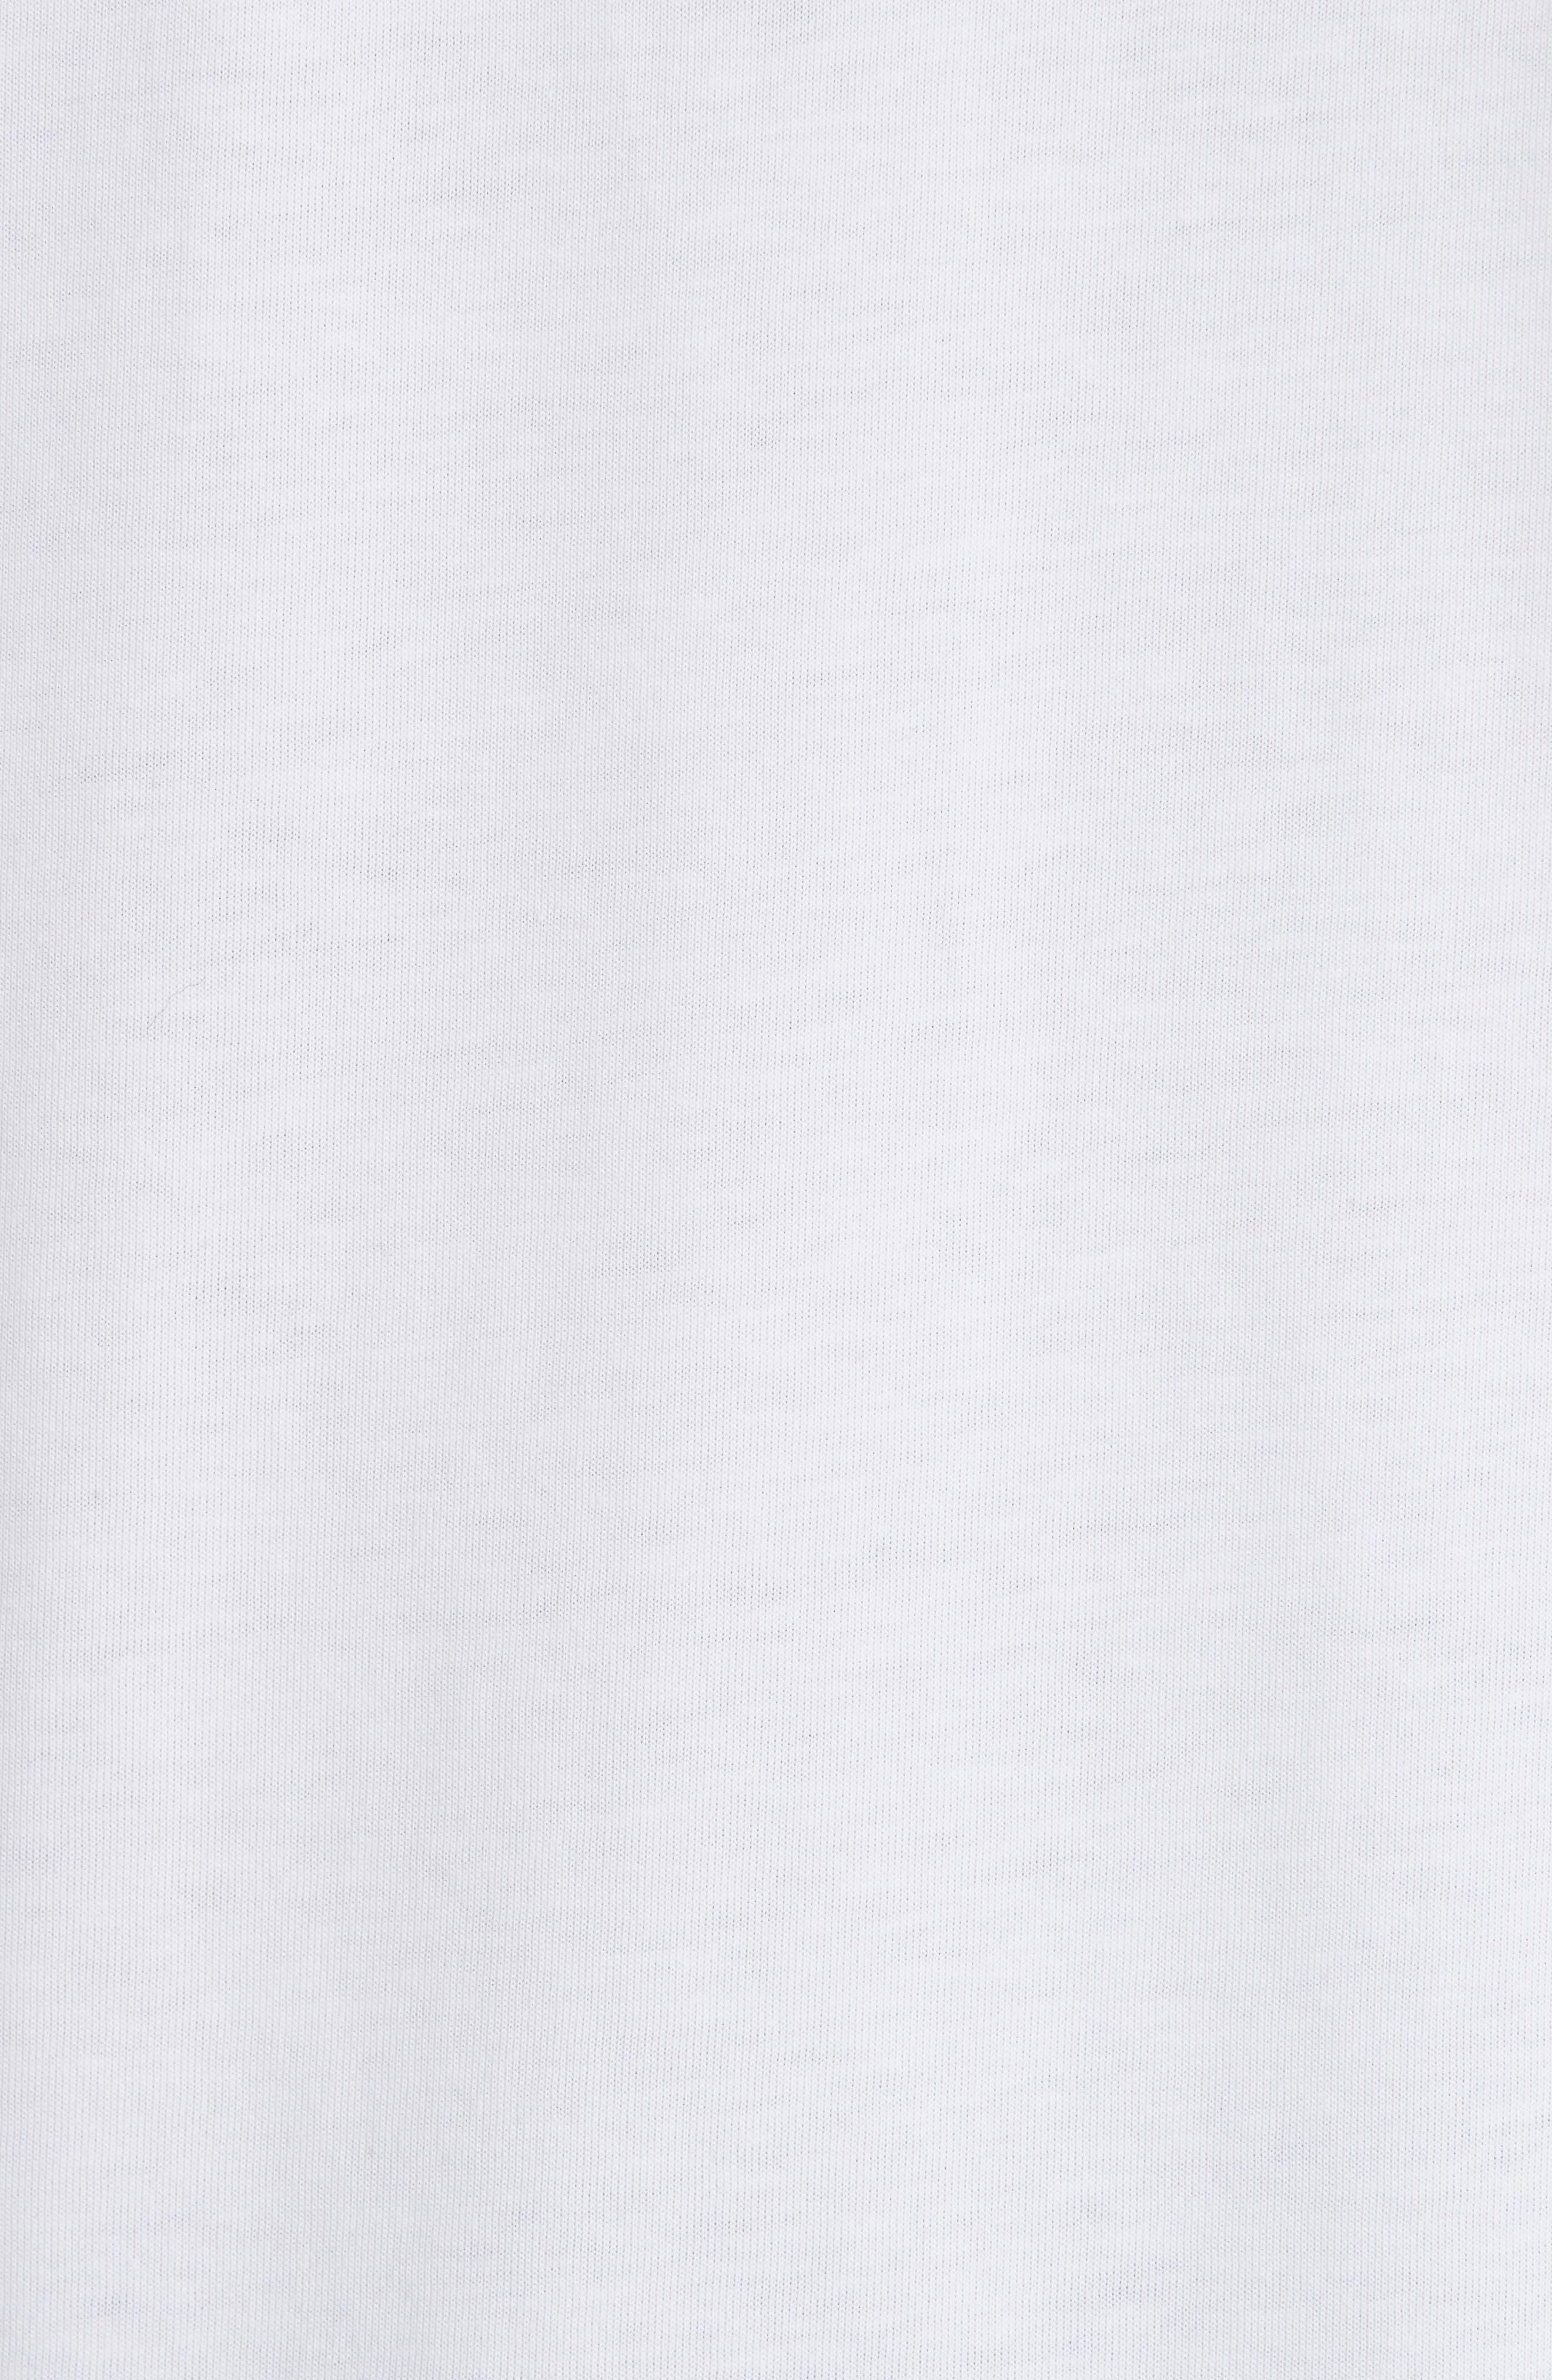 PS PAUL SMITH,                             Shipwreck Graphic T-Shirt,                             Alternate thumbnail 5, color,                             100